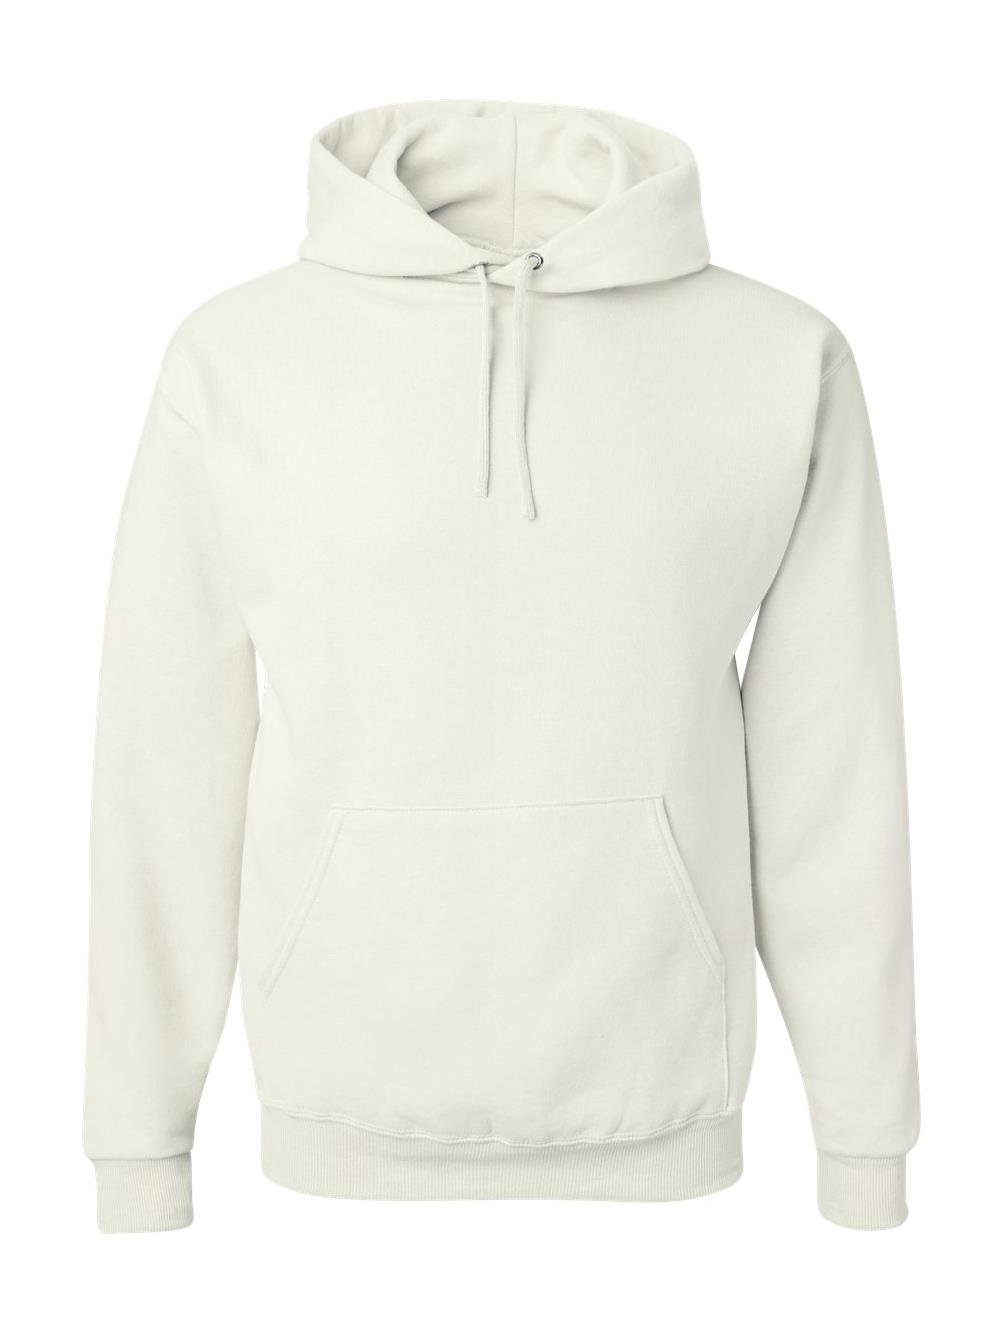 Jerzees Mens NuBlend Pull Over Hooded Sweatshirt, JZ996MR, L